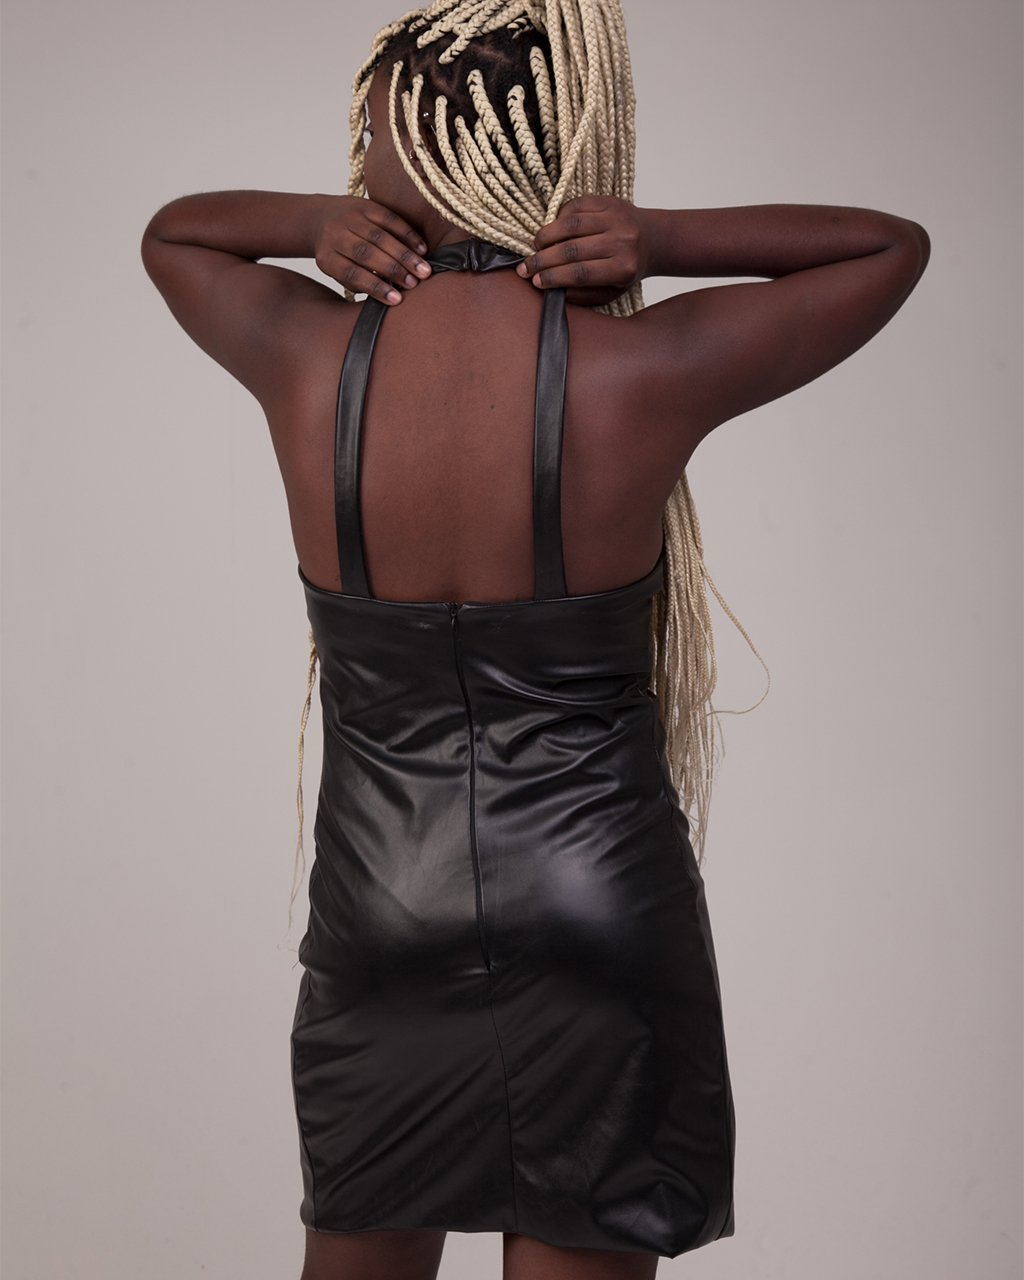 Vestido Gola Alta Vinil Fosco Preto